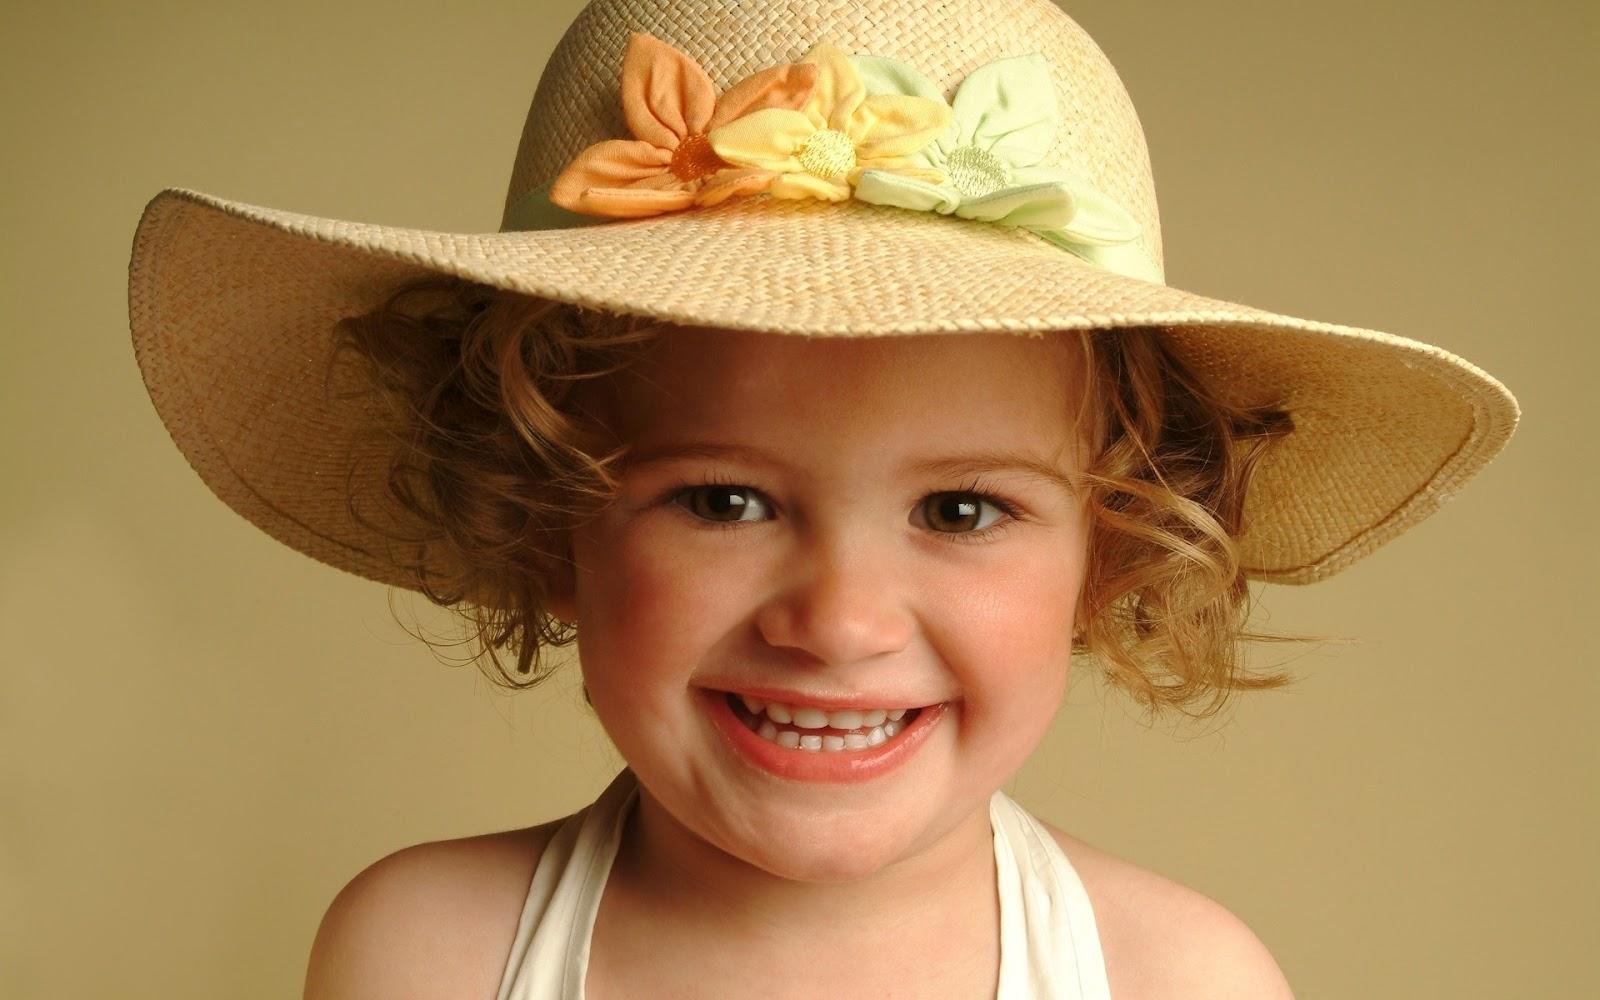 hd bebek resimleri rooteto 30 En Güzel HD Kalite Bebek Resimleri moda_trend